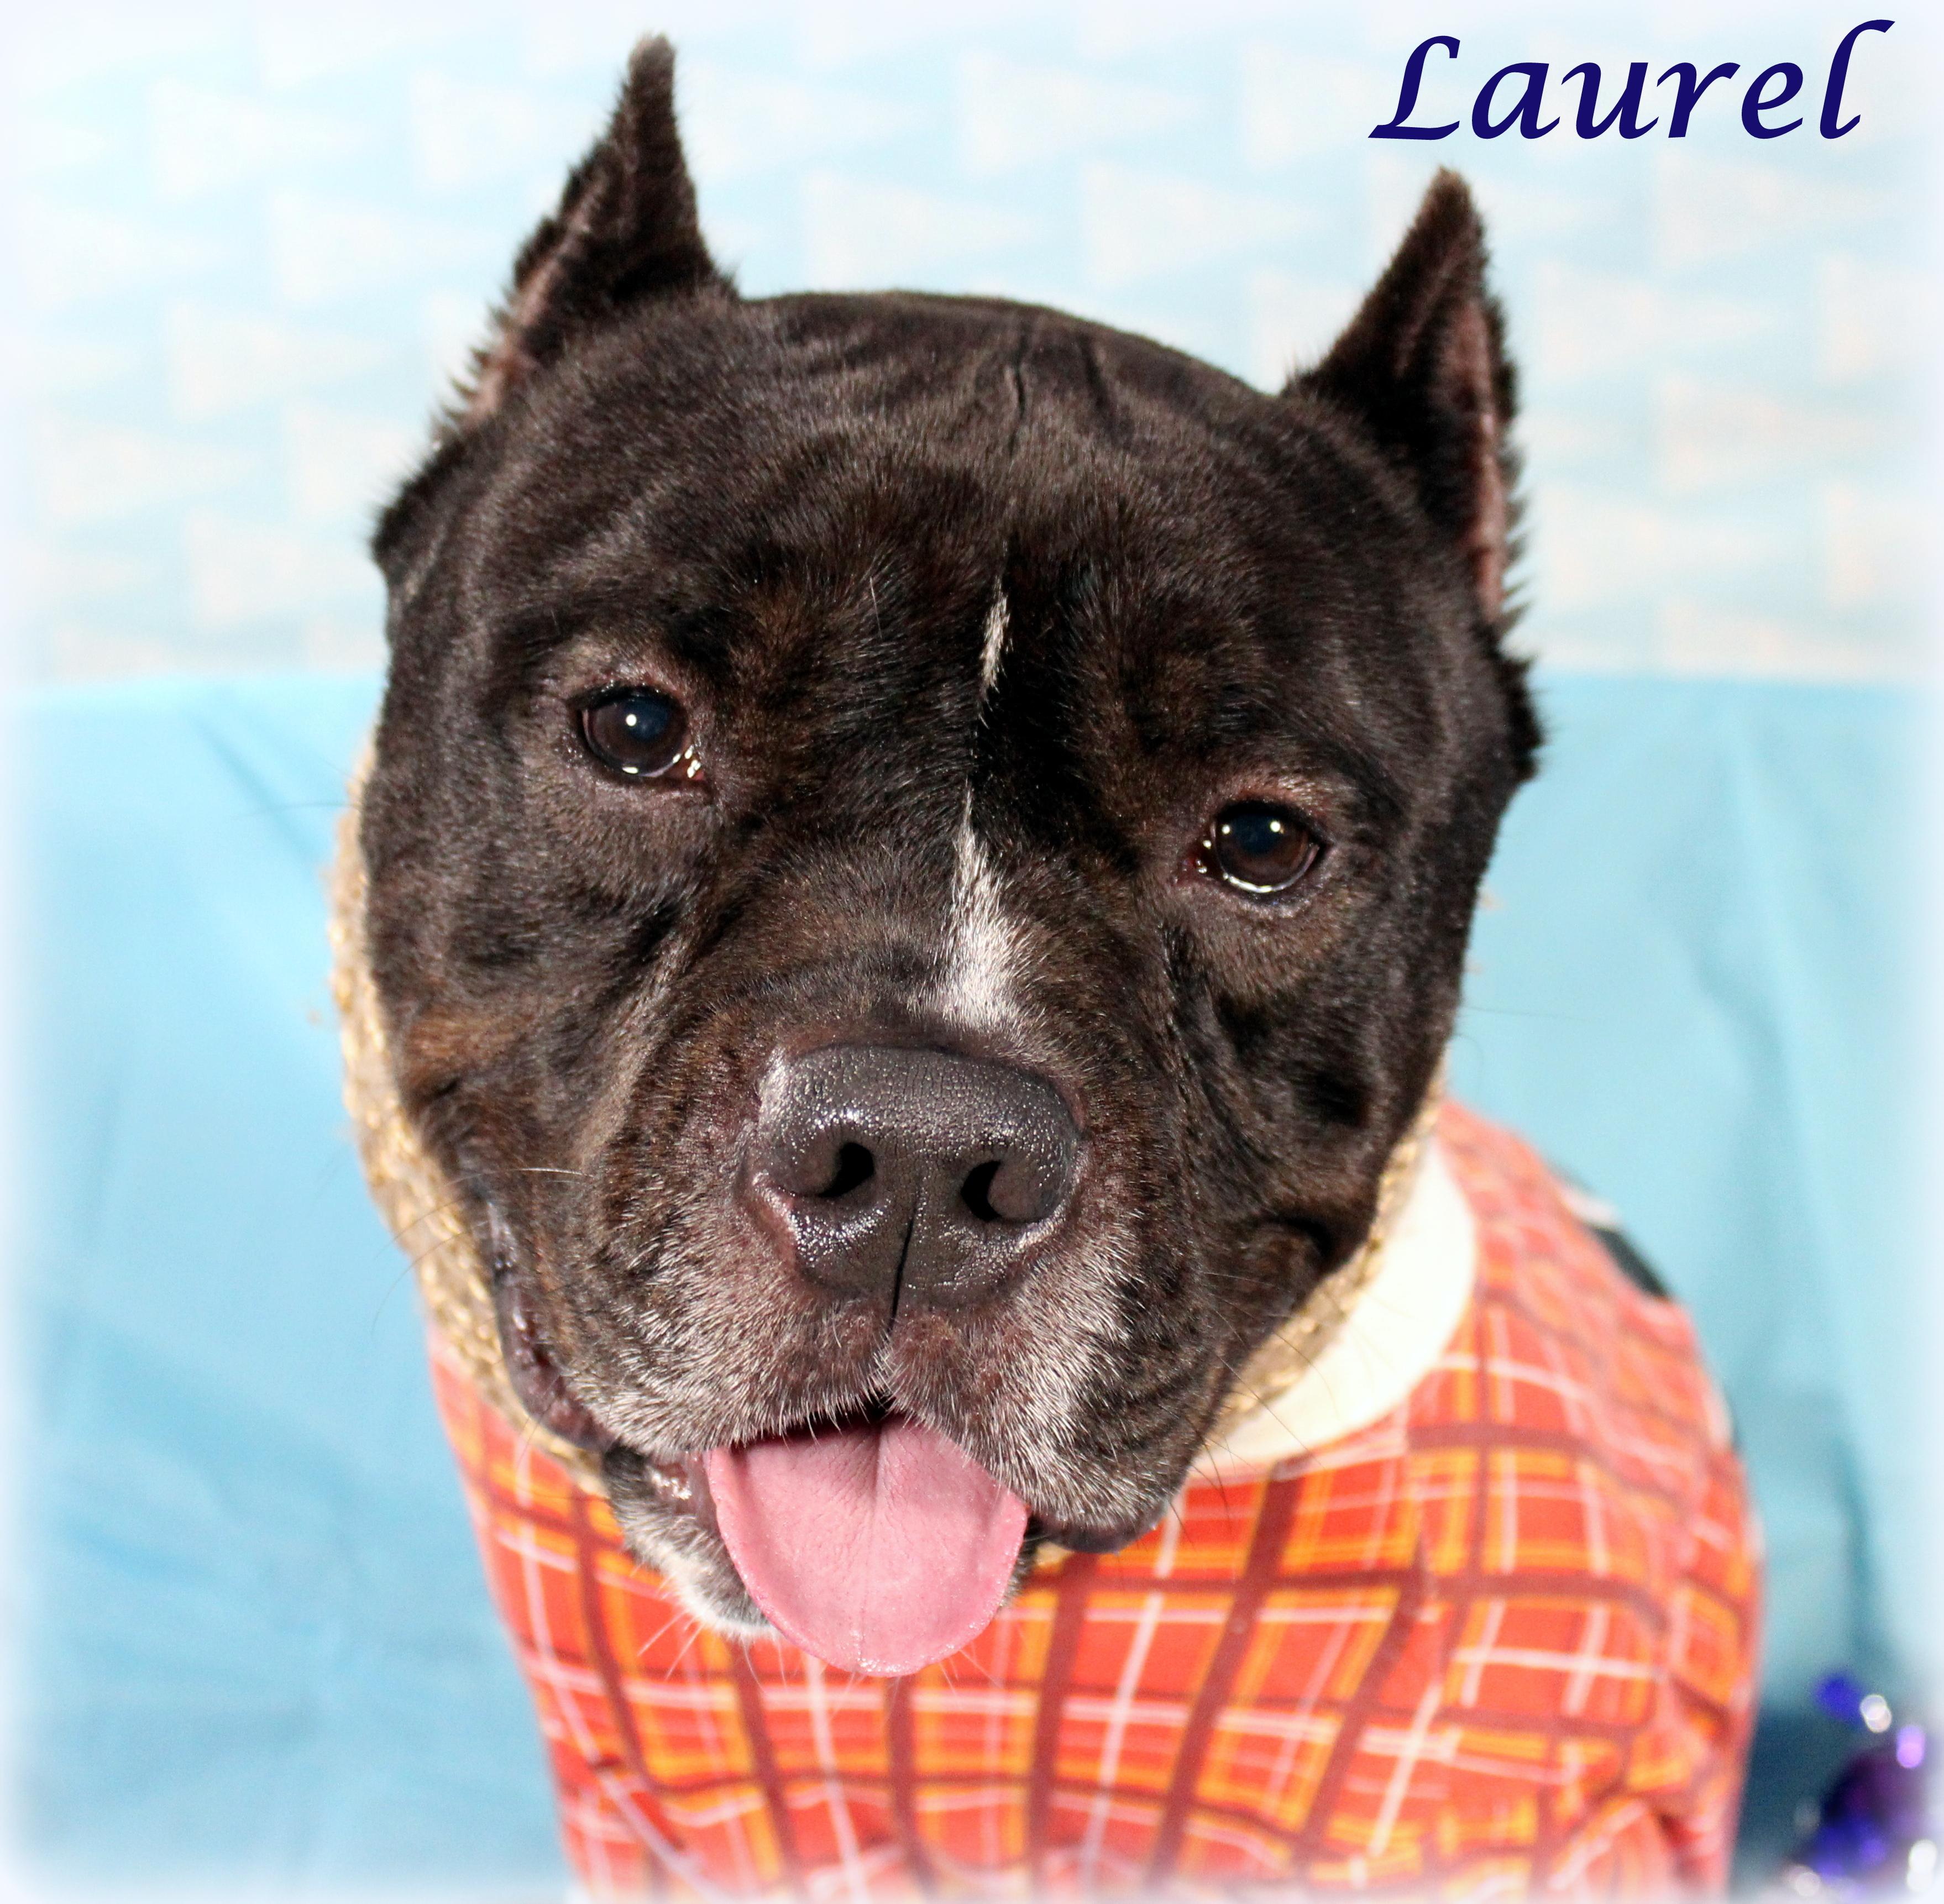 Laurel (Happy & Easygoing Boy, Good with Older Kids & Big Dogs)